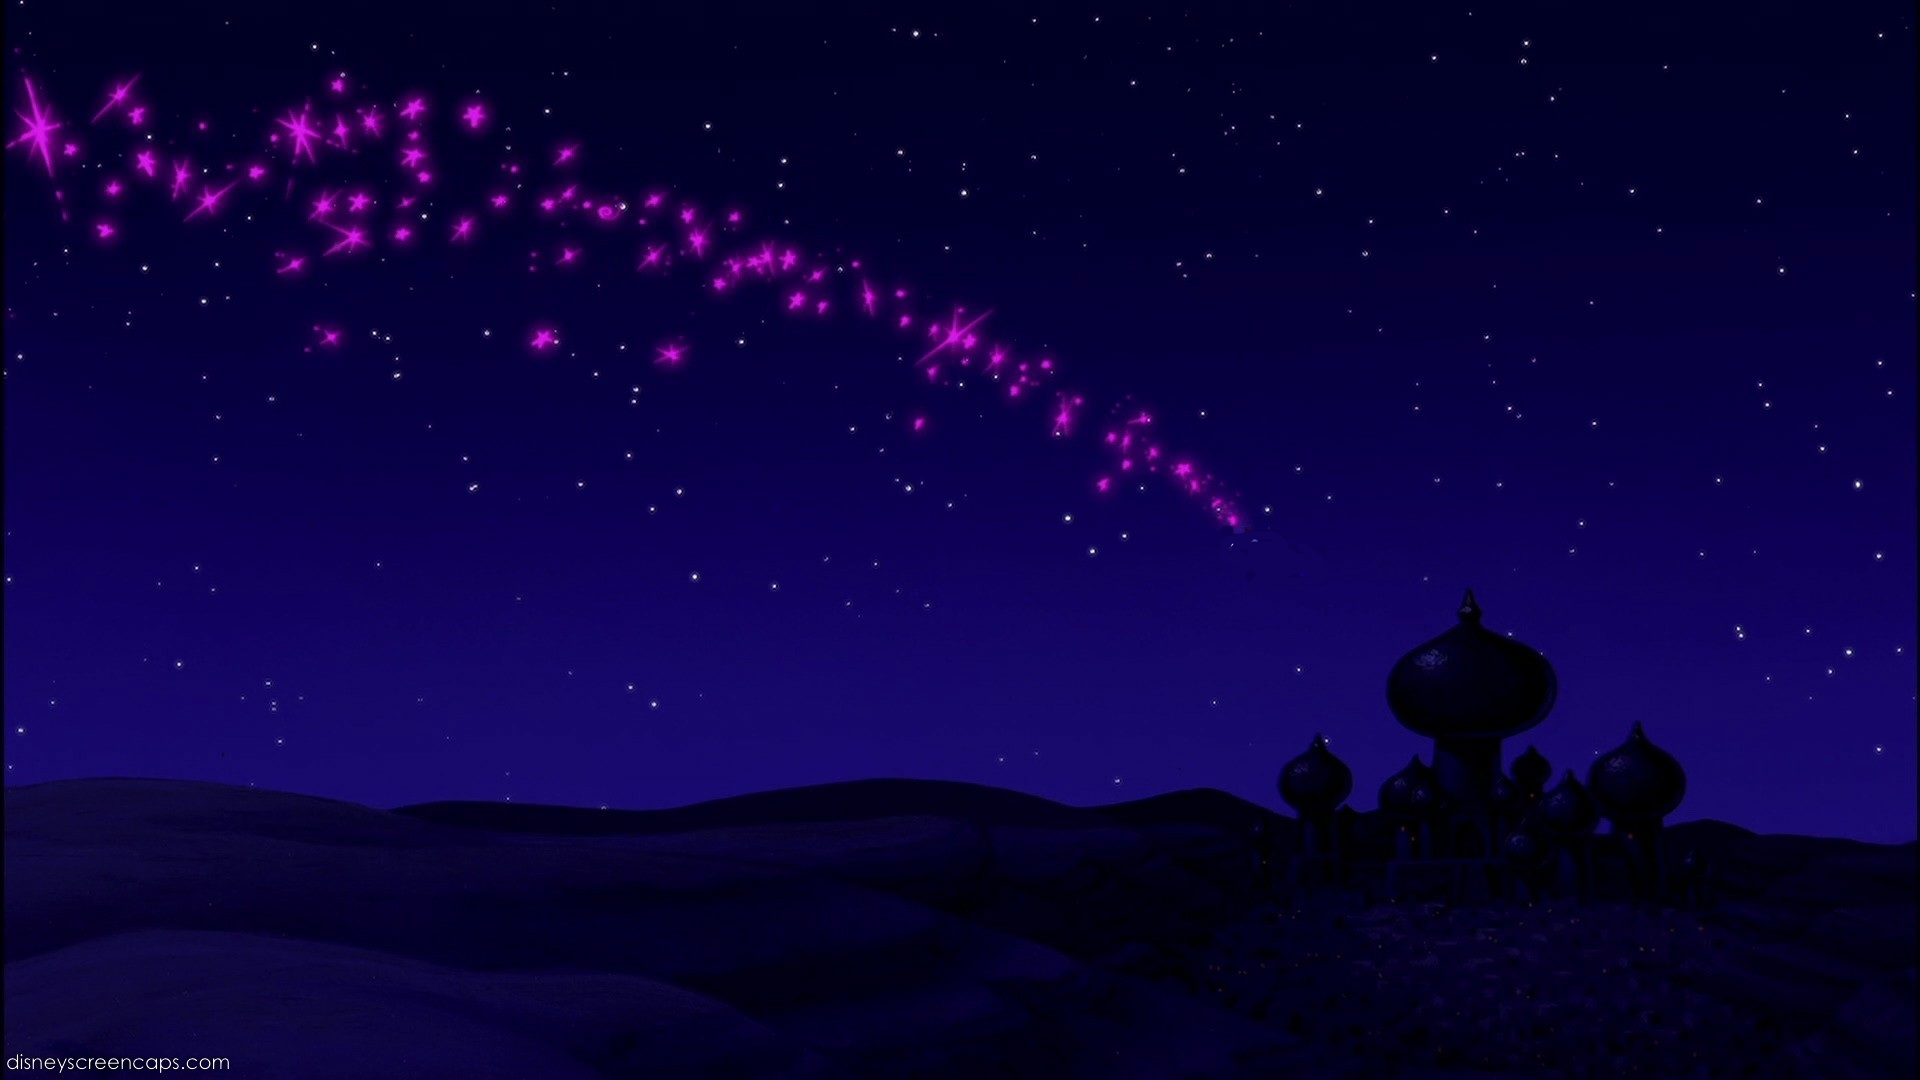 Empty Backdrop from Aladin